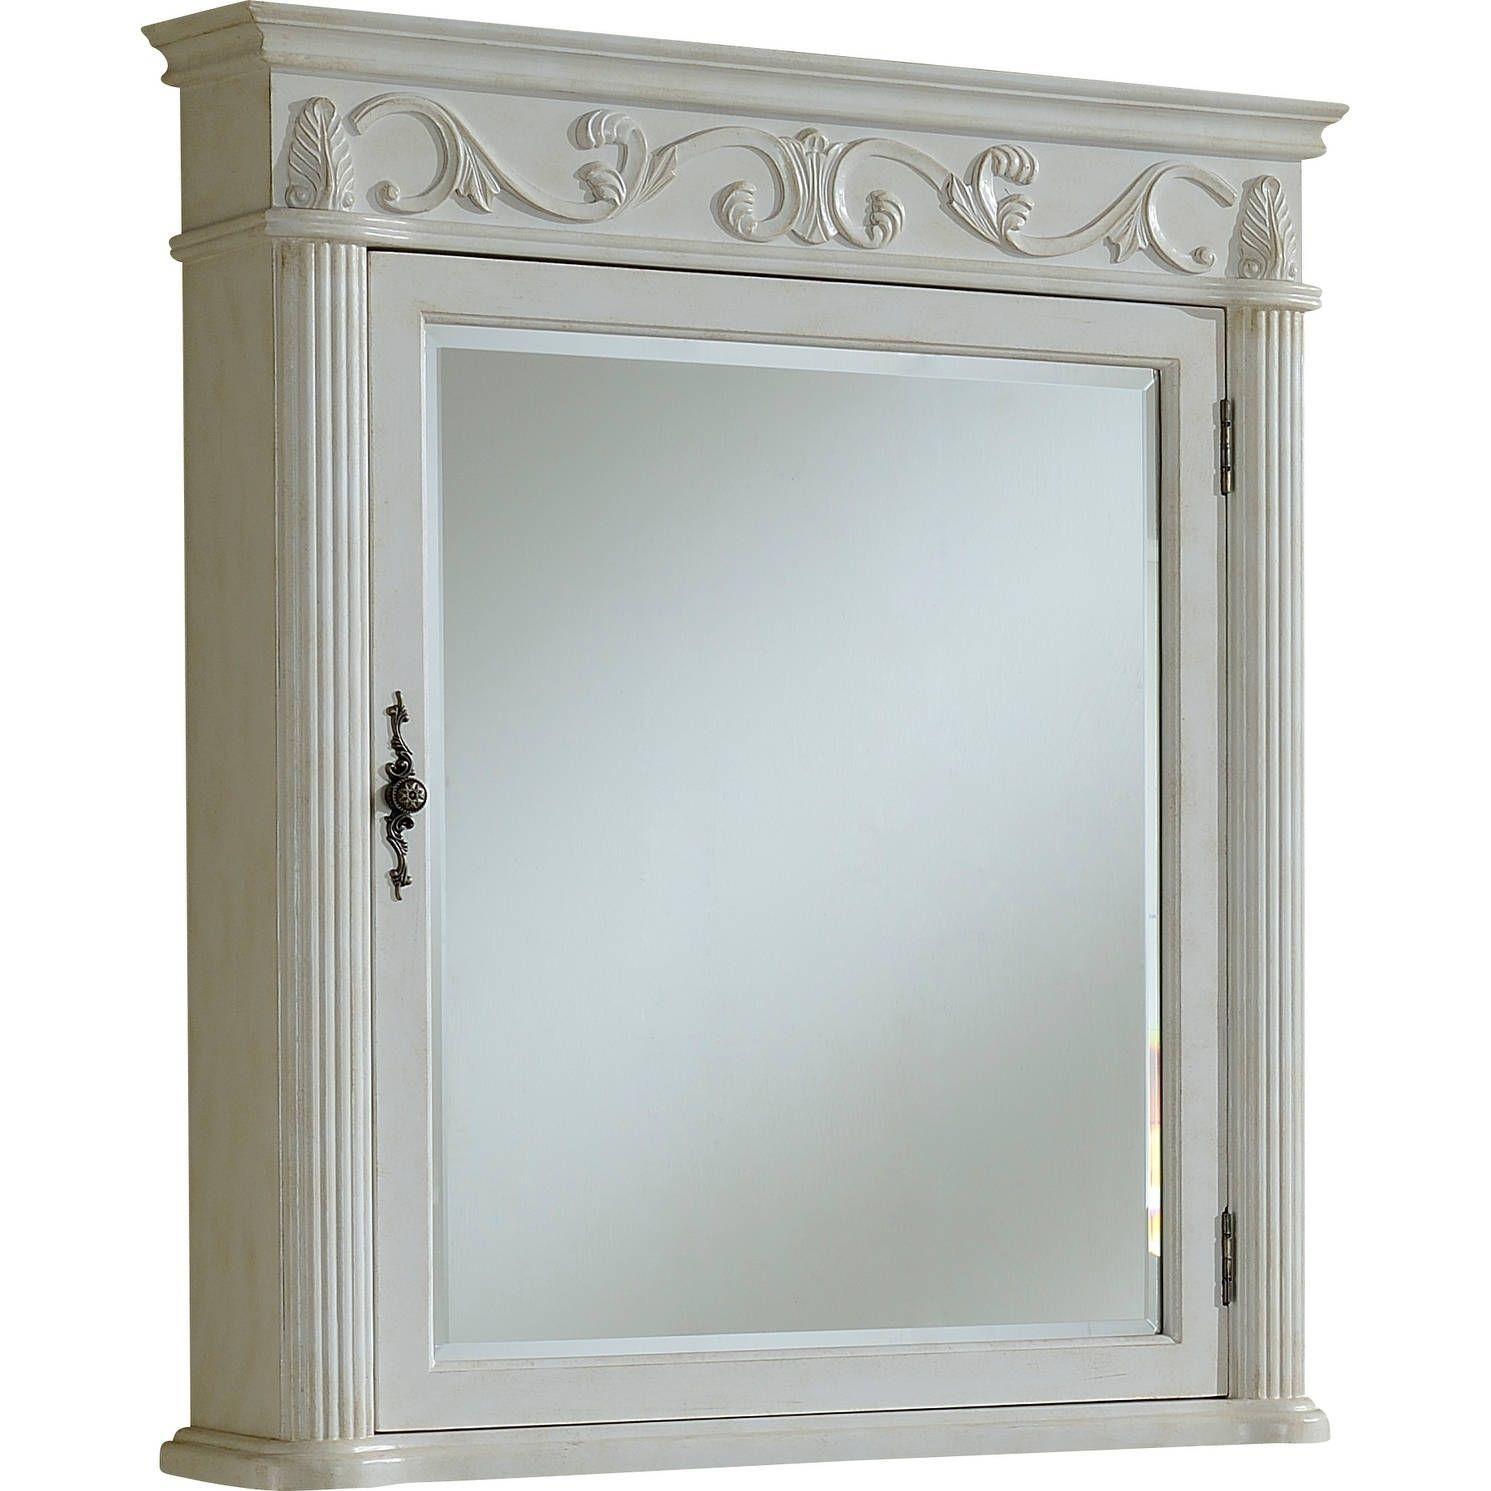 Heritage Roman 32 Antique White Medicine Cabinet - Antique White (Birchwood) - Heritage Roman 32 Antique White Medicine Cabinet - Antique White